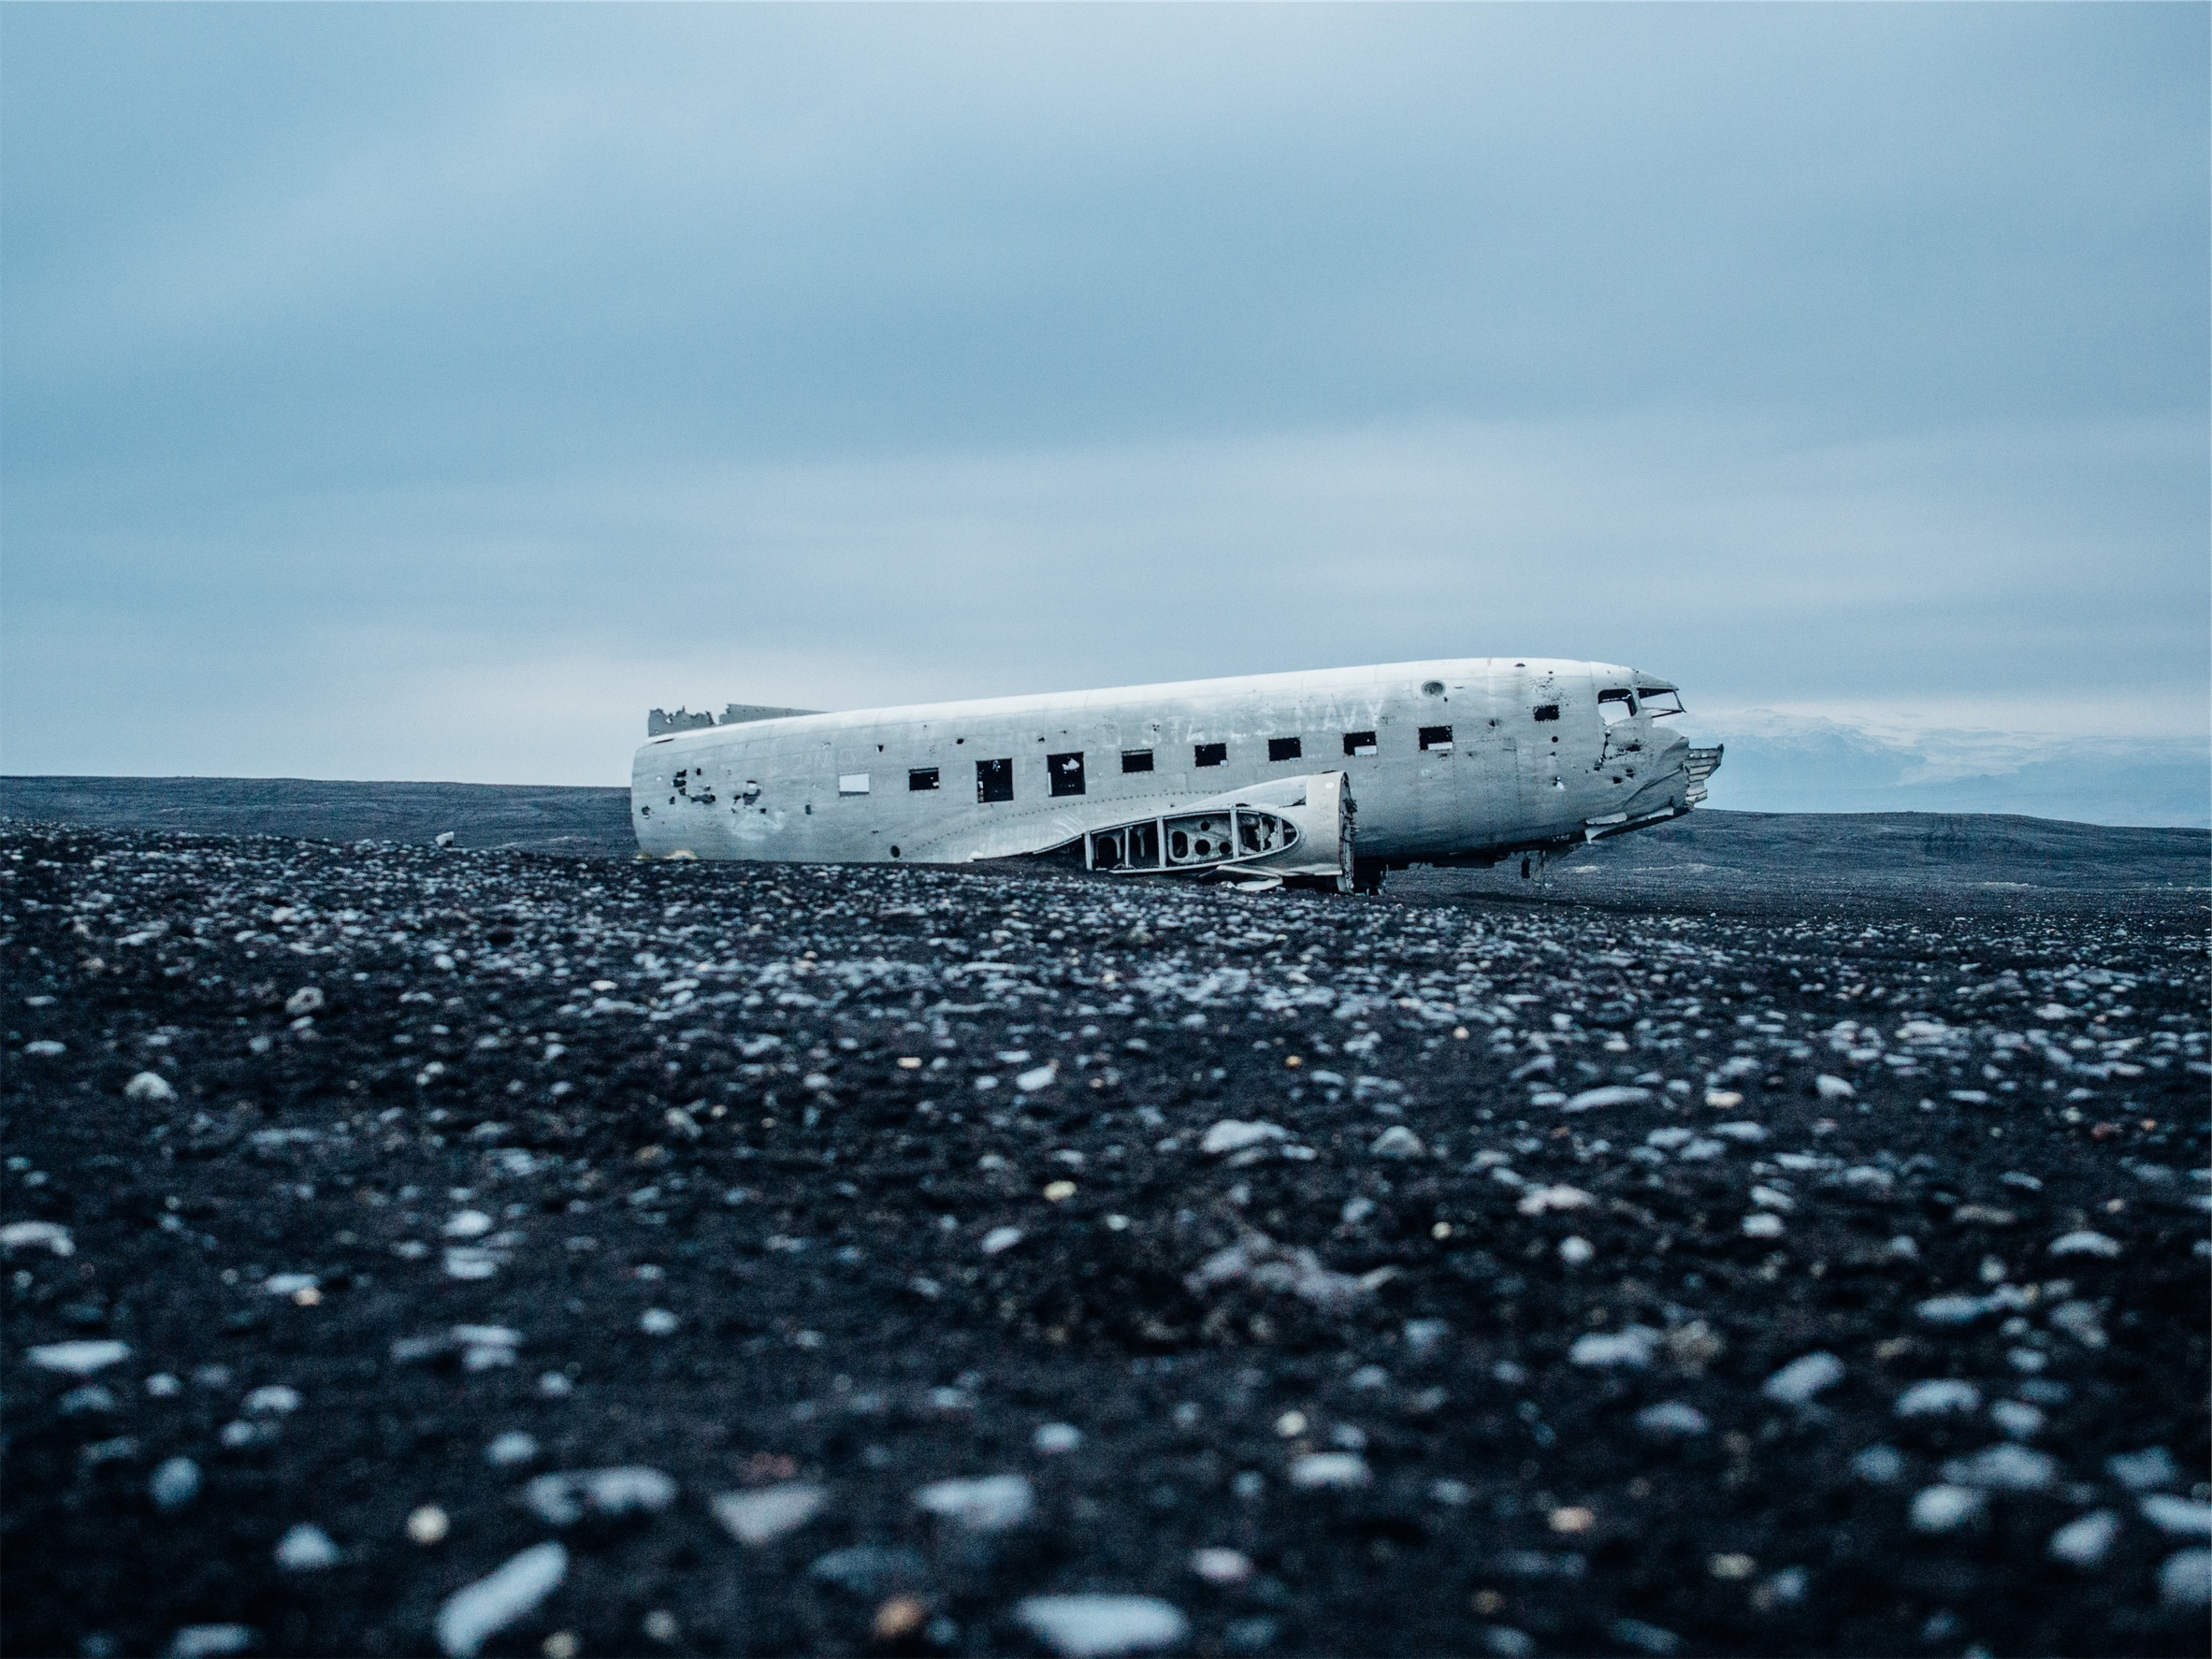 airplane-crash-569351